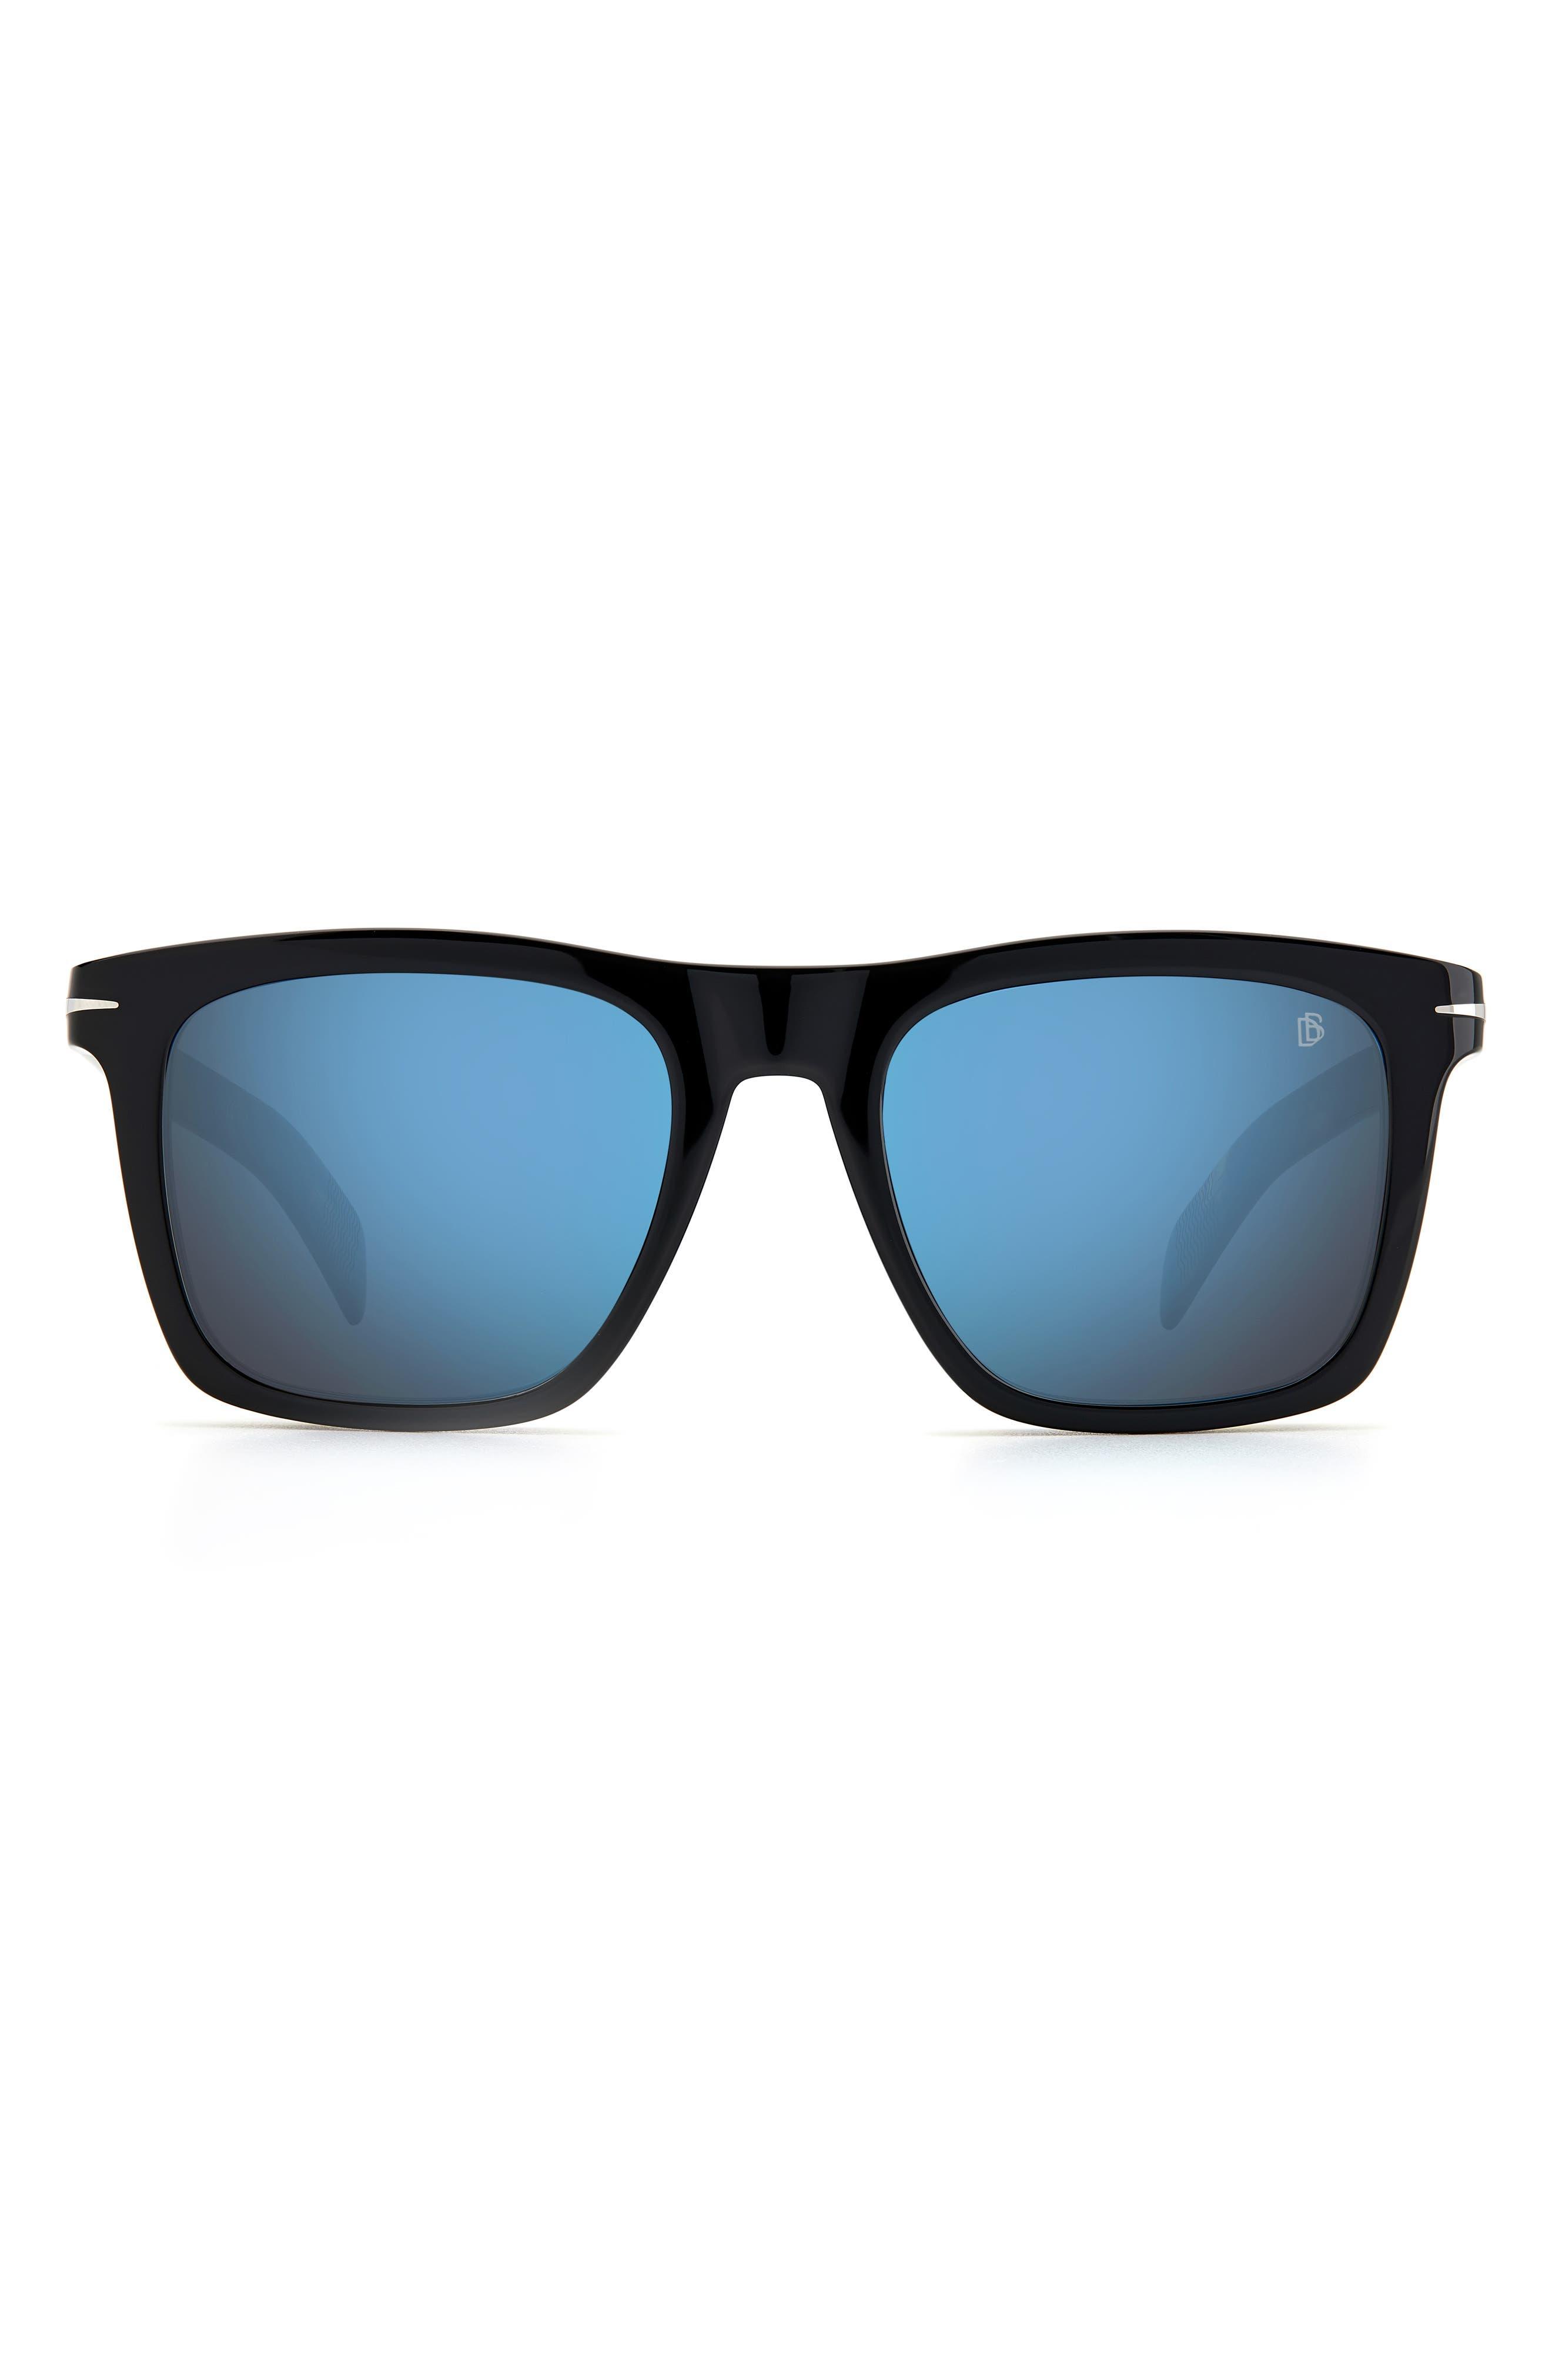 Men's David Beckham 51mm International Fit Square Sunglasses